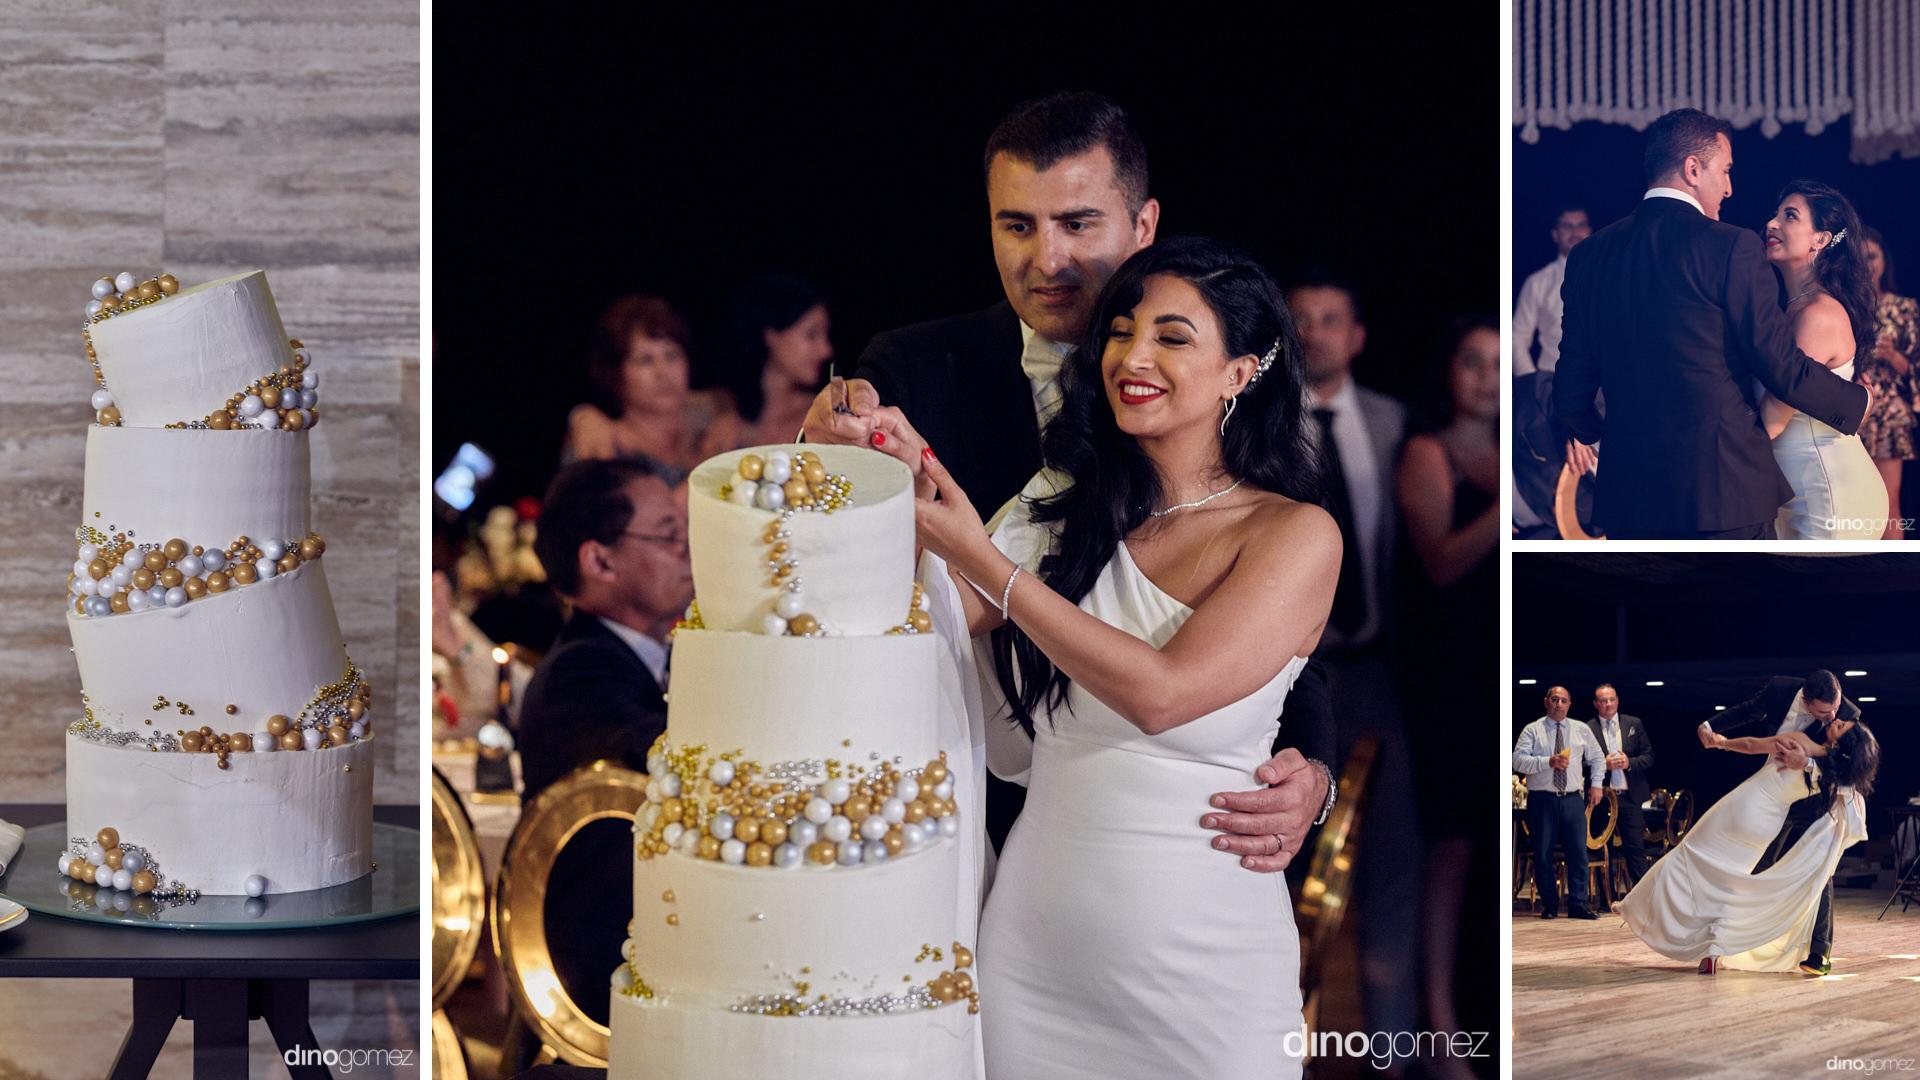 Persian Wedding Cake Cutting In A Cabo Wedding